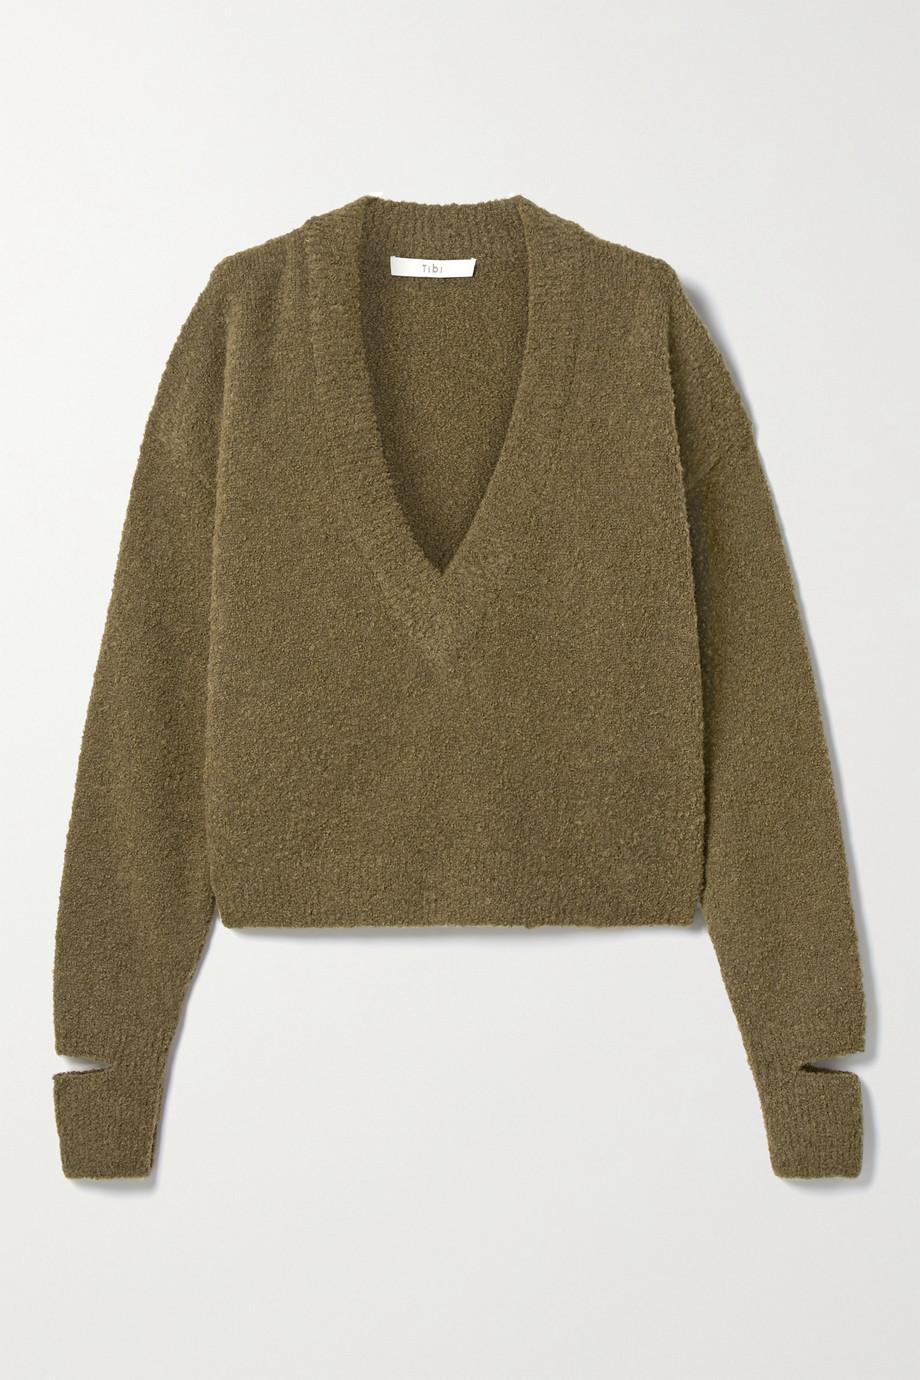 Tibi Cropped alpaca-blend bouclé sweater